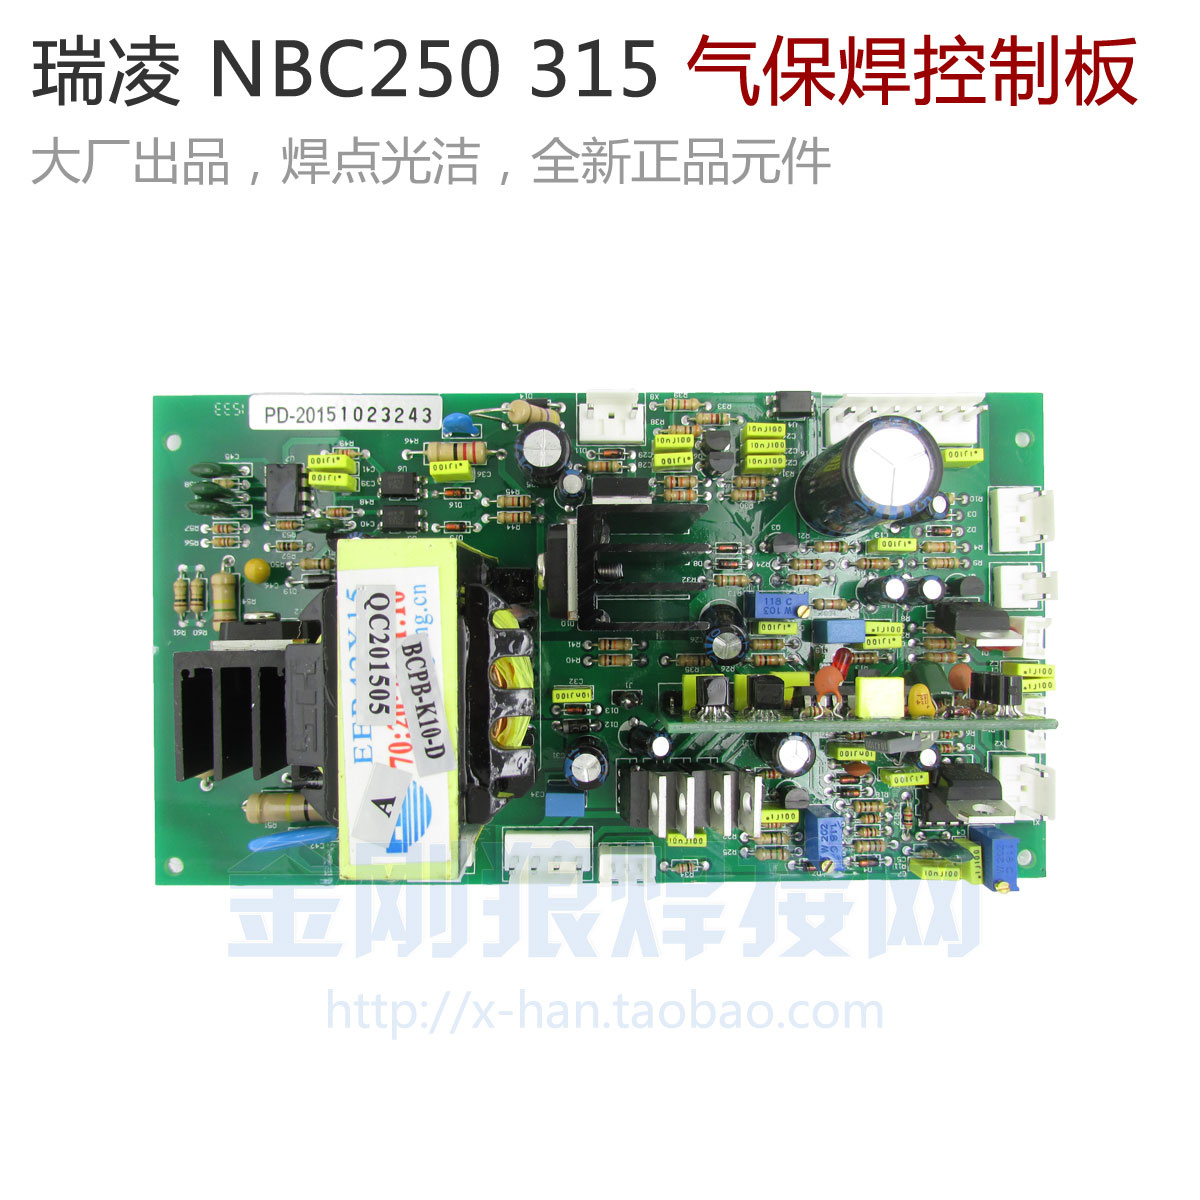 NBC250 315 MOS Inverter Carbon Dioxide Gas Shielded Welding Machine Control Board Circuit Board